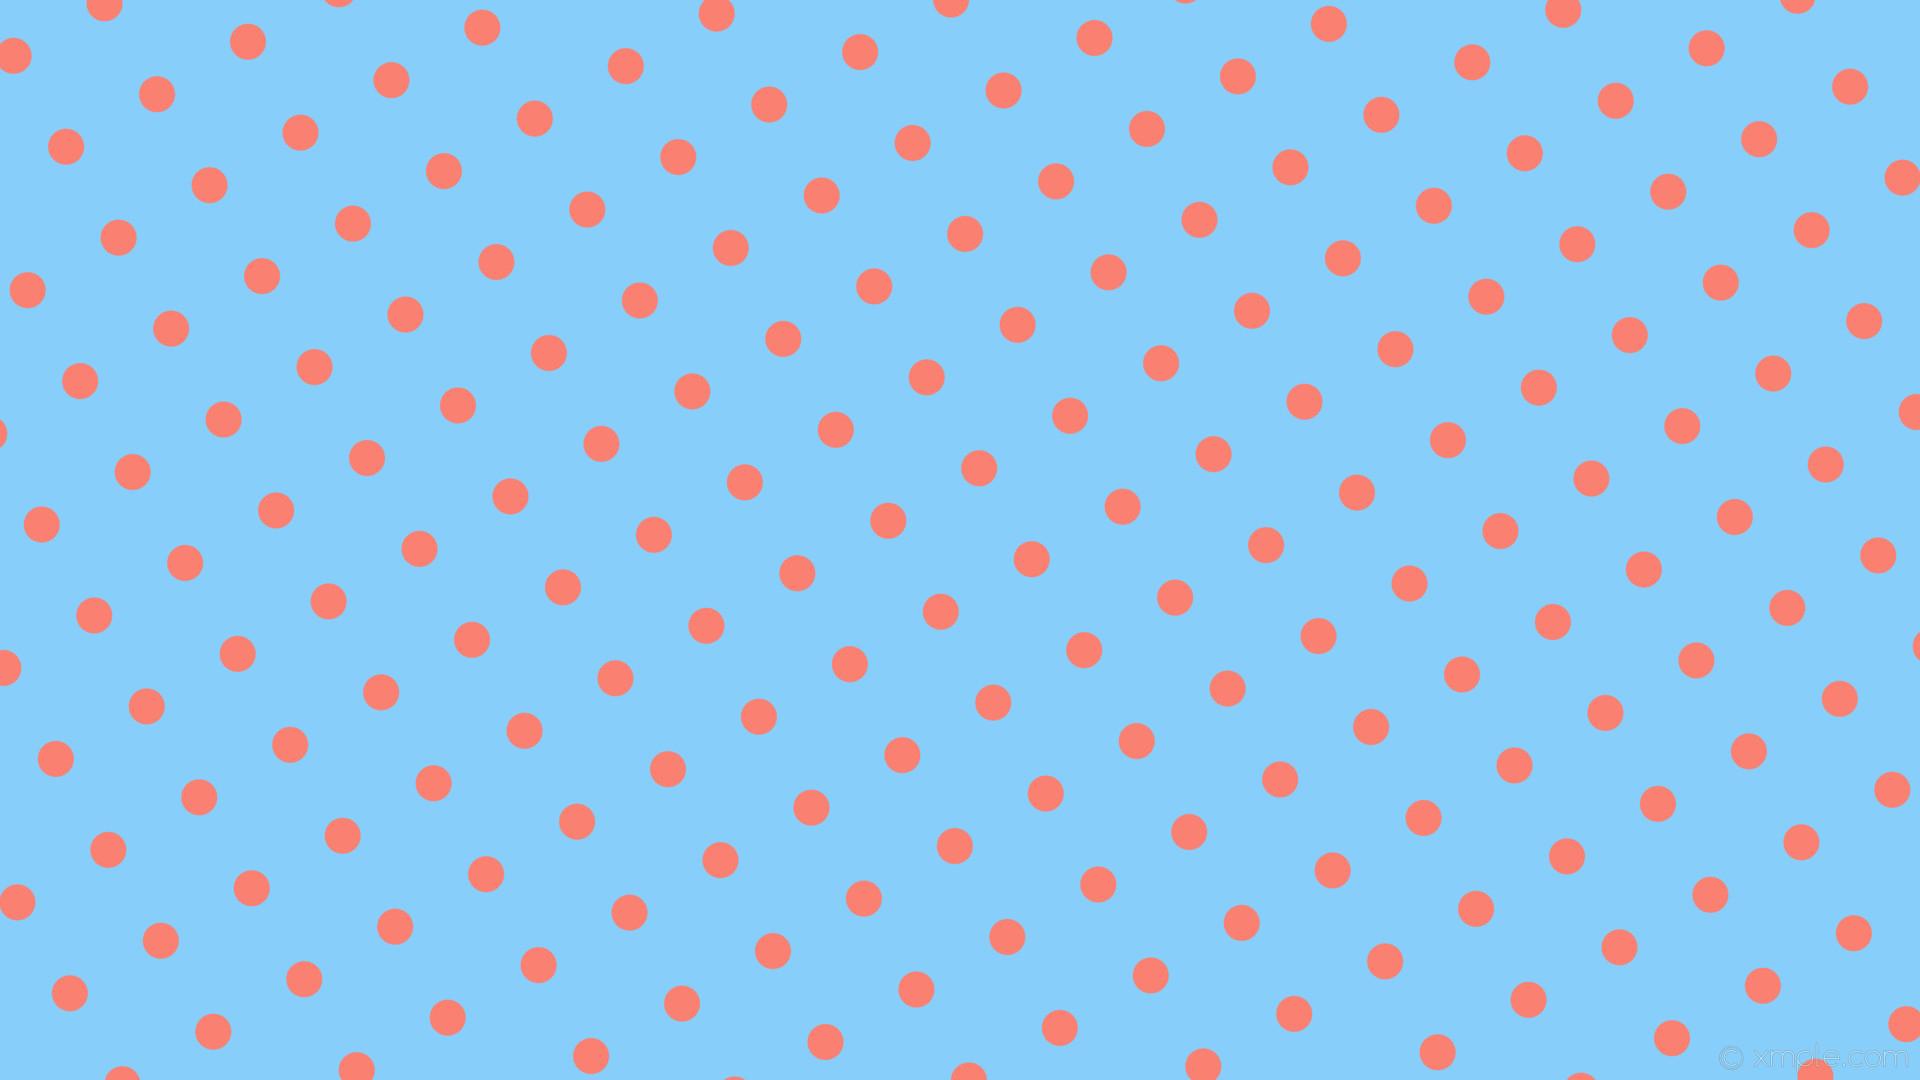 wallpaper red polka dots blue spots light sky blue salmon #87cefa #fa8072  300°